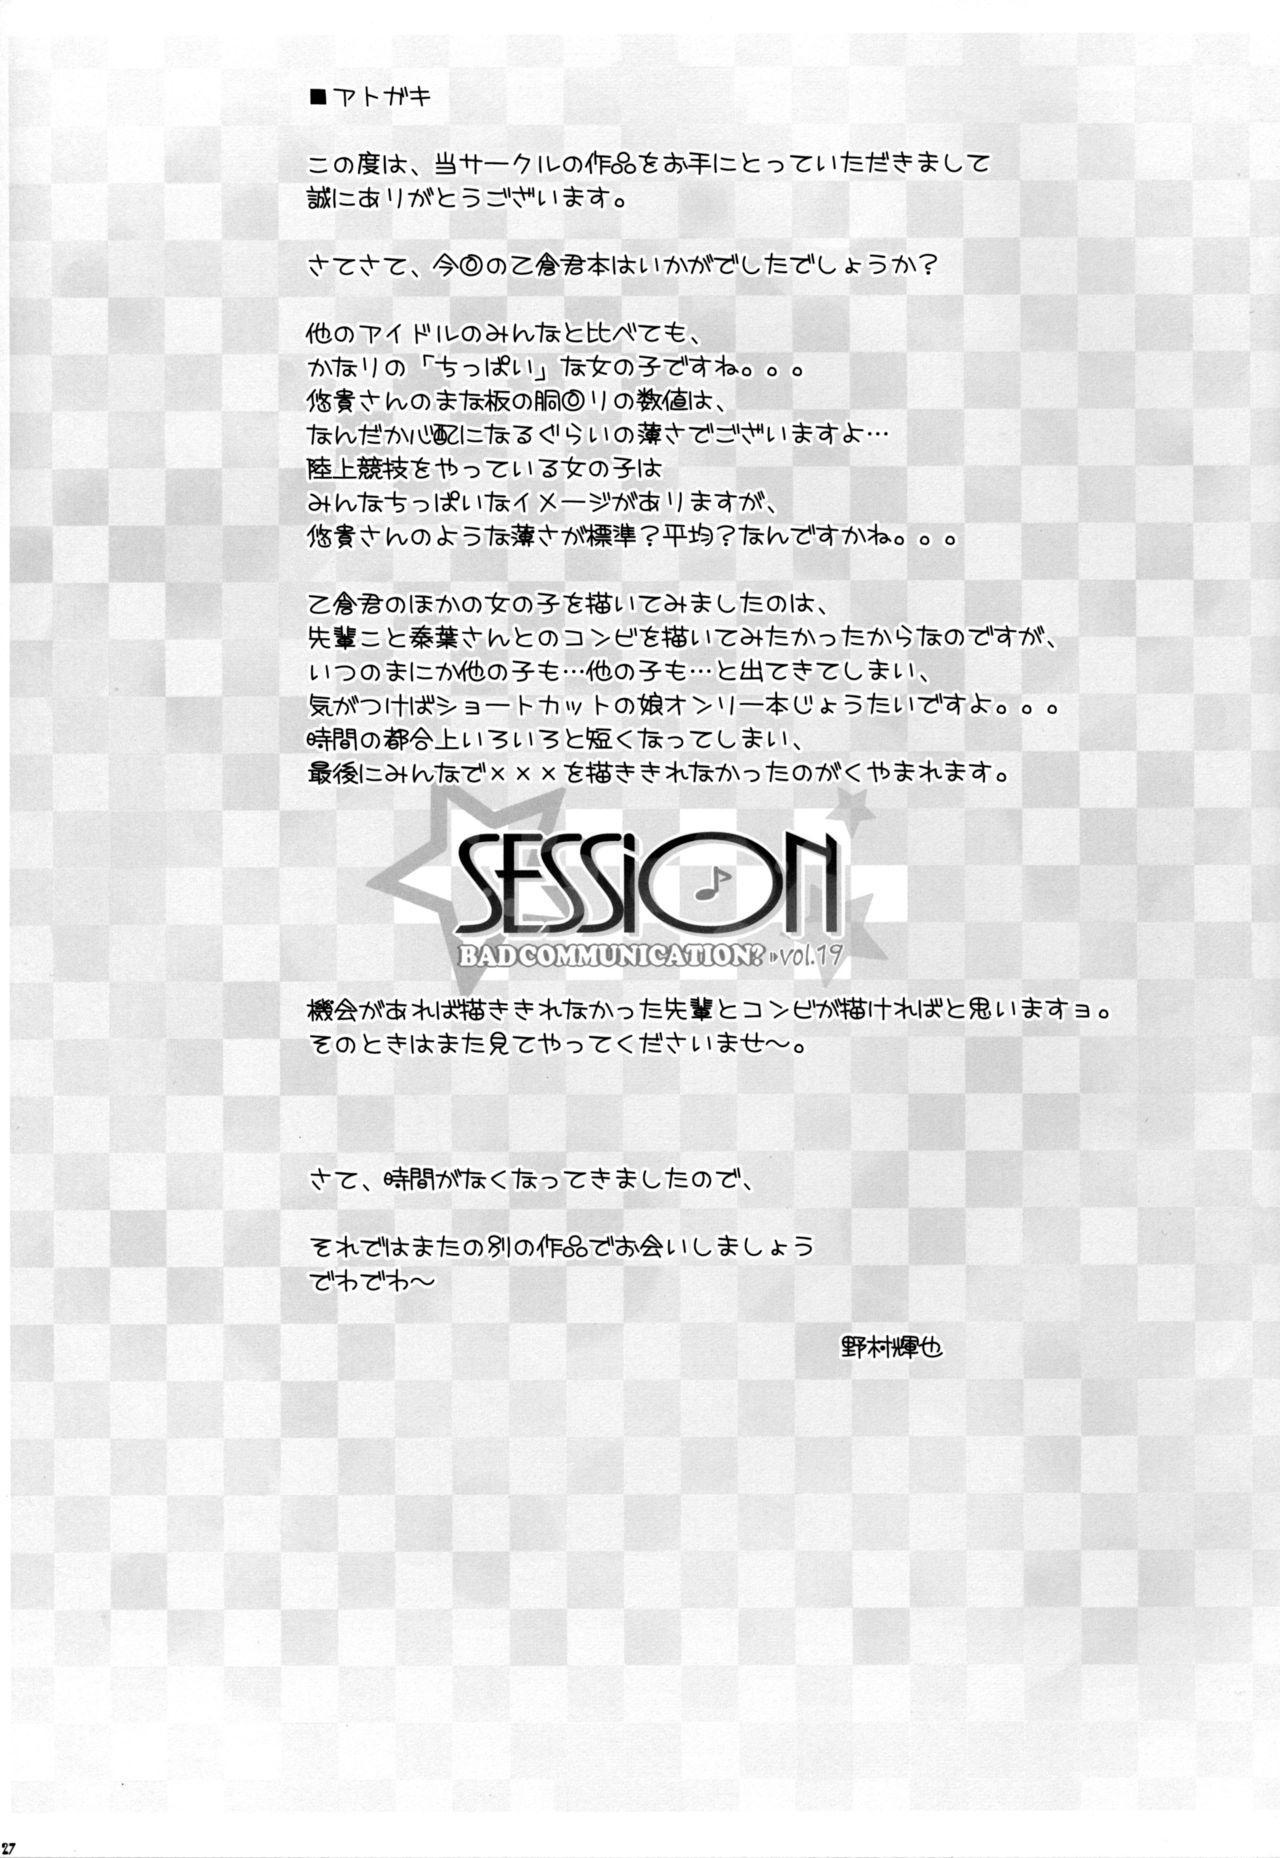 SESSION 26